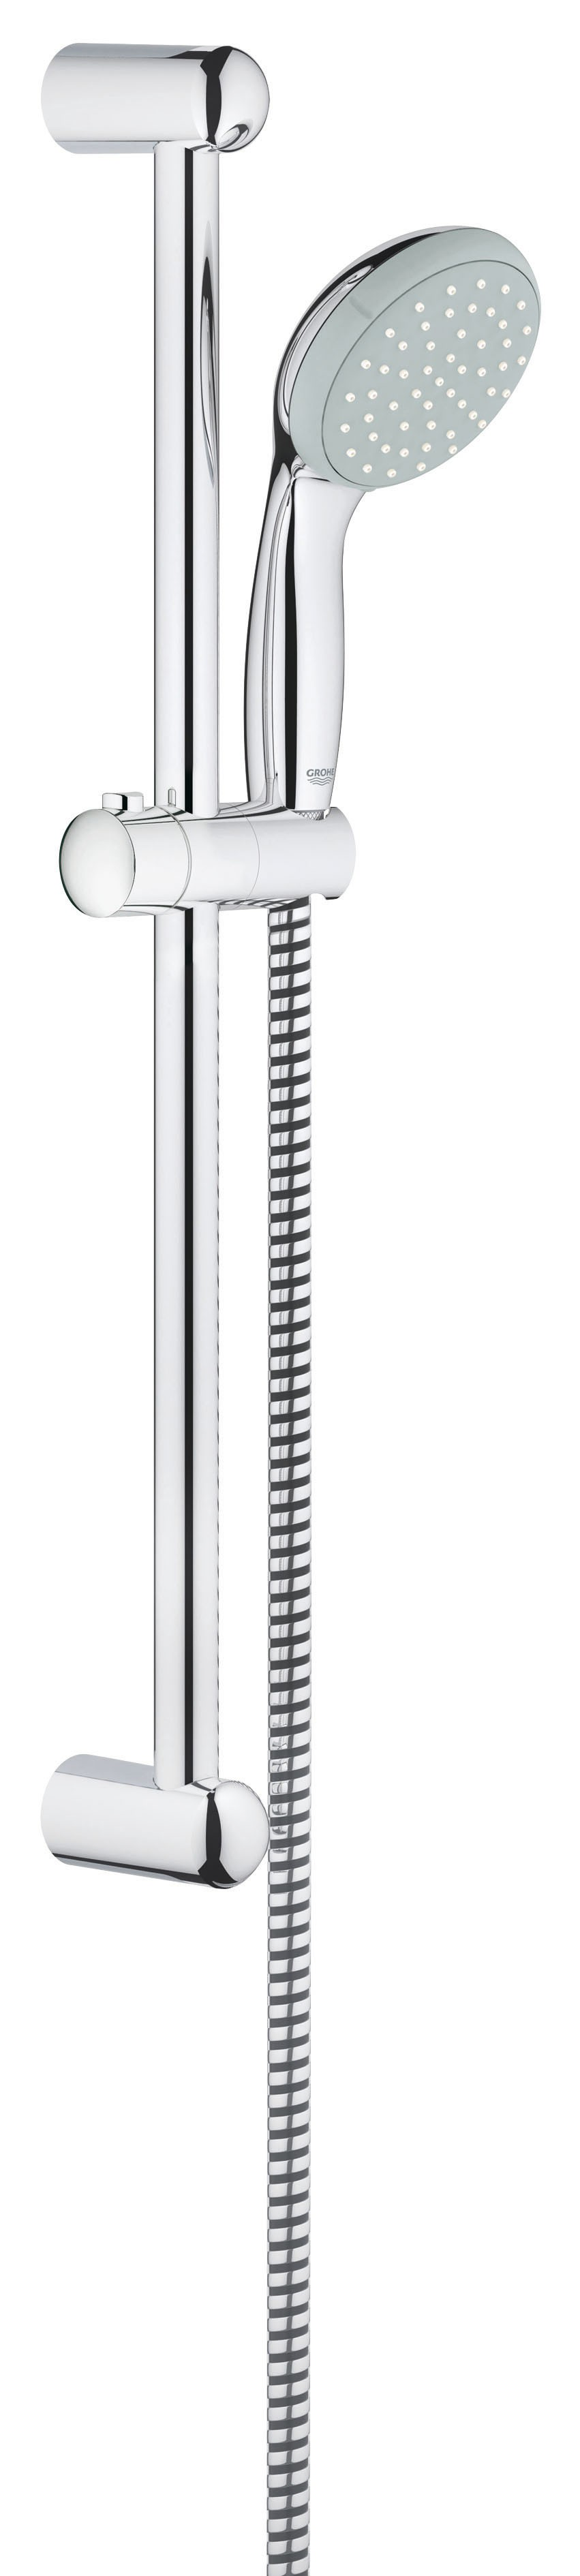 Душевой гарнитур Grohe 27853000 Tempesta Classic (ручной душ, штанга 600 мм, шланг 1750 мм), хром (27853000)